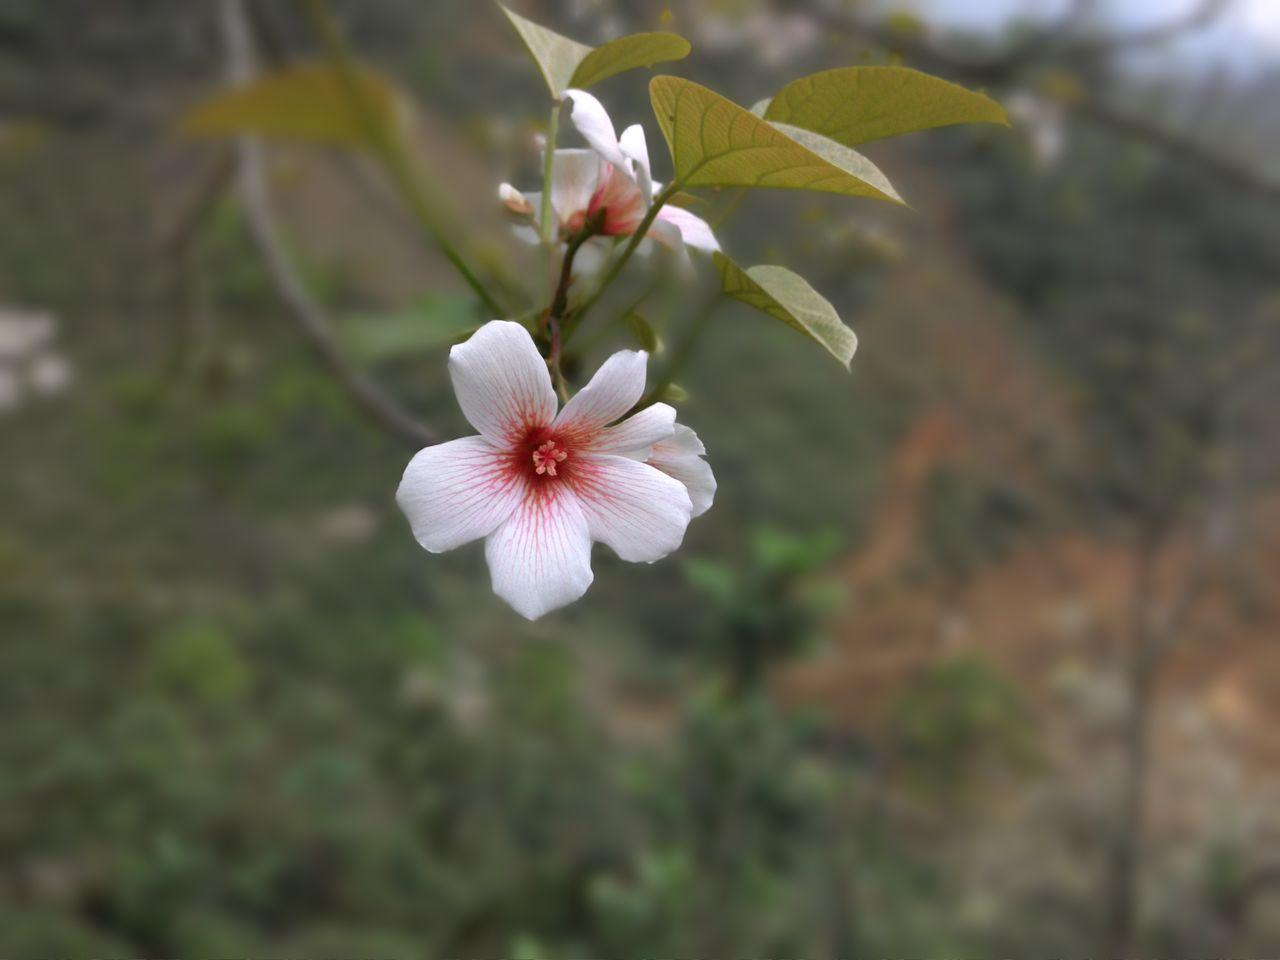 Hoa Trẩu - ảnh chụp bằng phone First Eyeem Photo